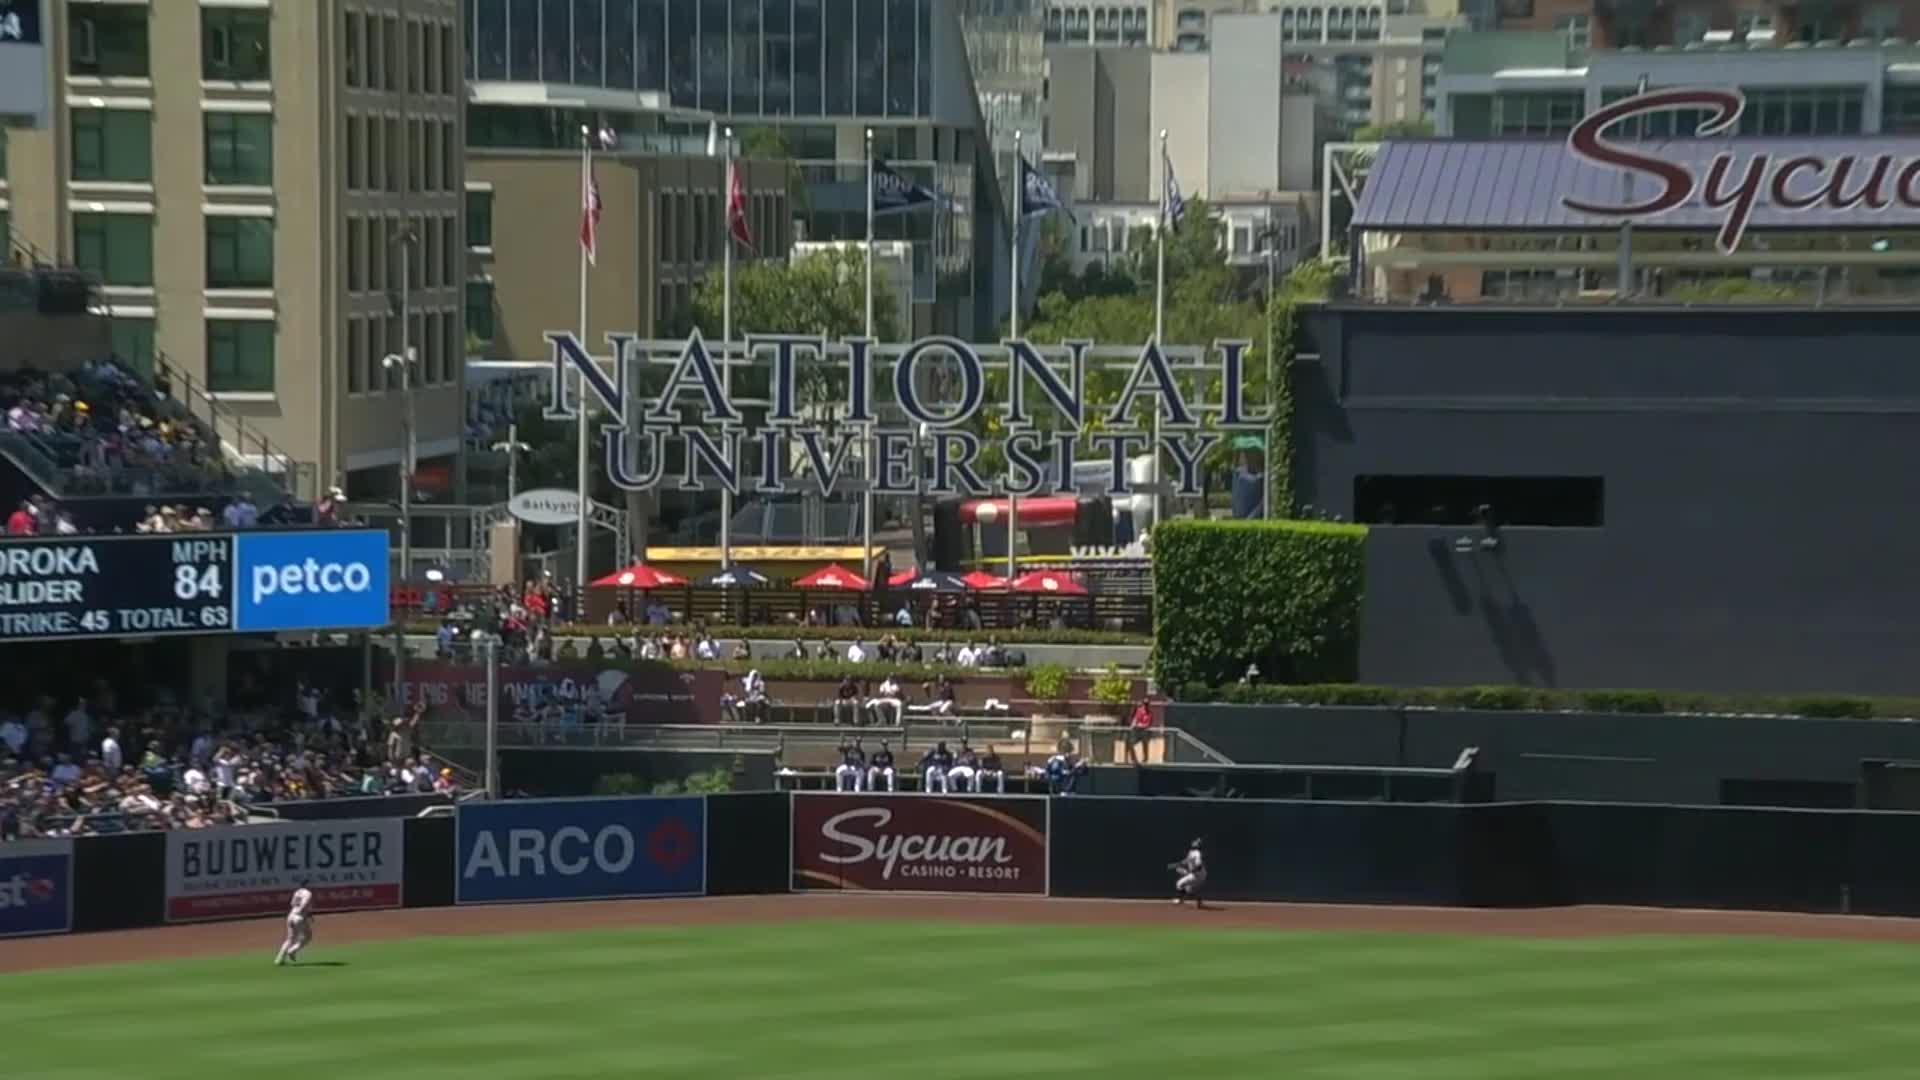 atlanta, baseball, braves, Ronald Acuña Jr. robs Manny Machado of home run - Angle 2 GIFs